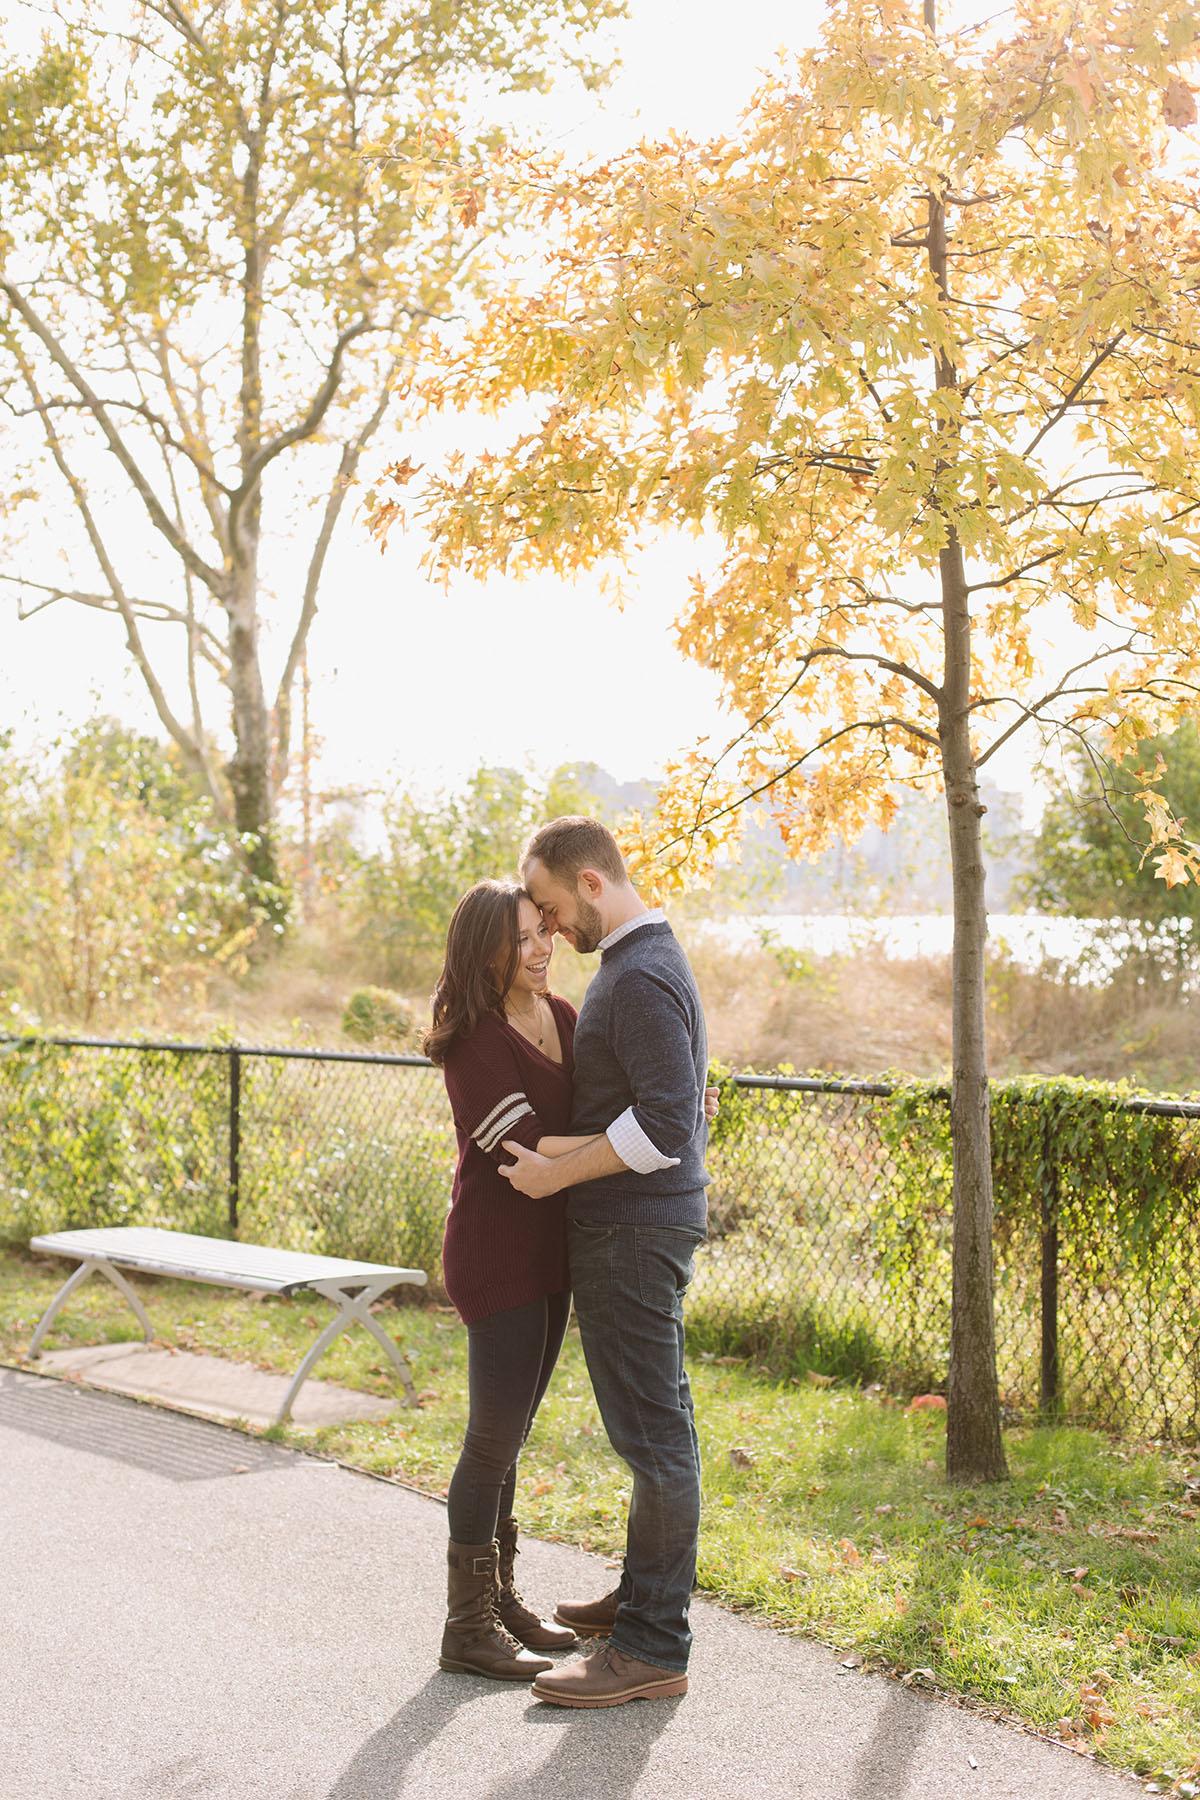 Autumn New York Engagement Photos